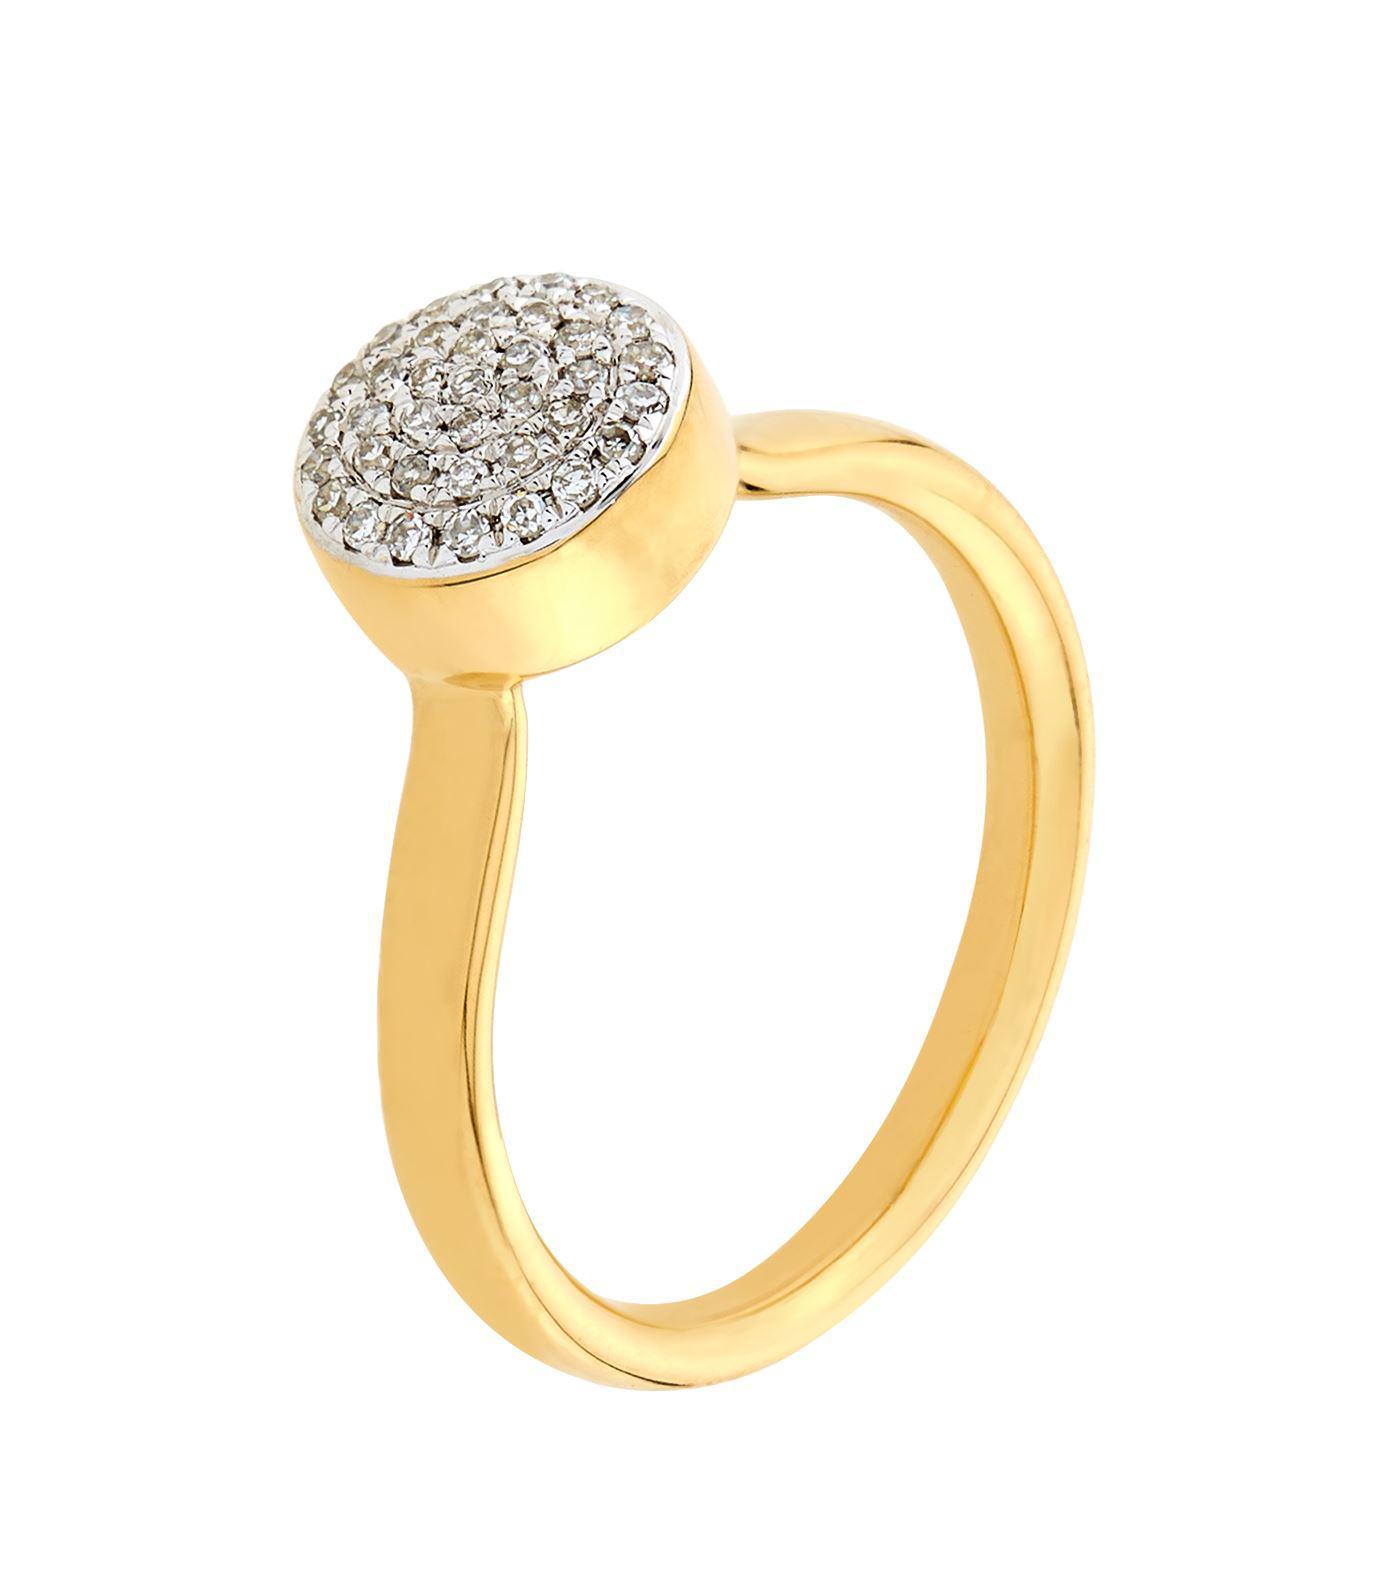 Ava Diamond Button Ring, Gold Vermeil on Silver Monica Vinader